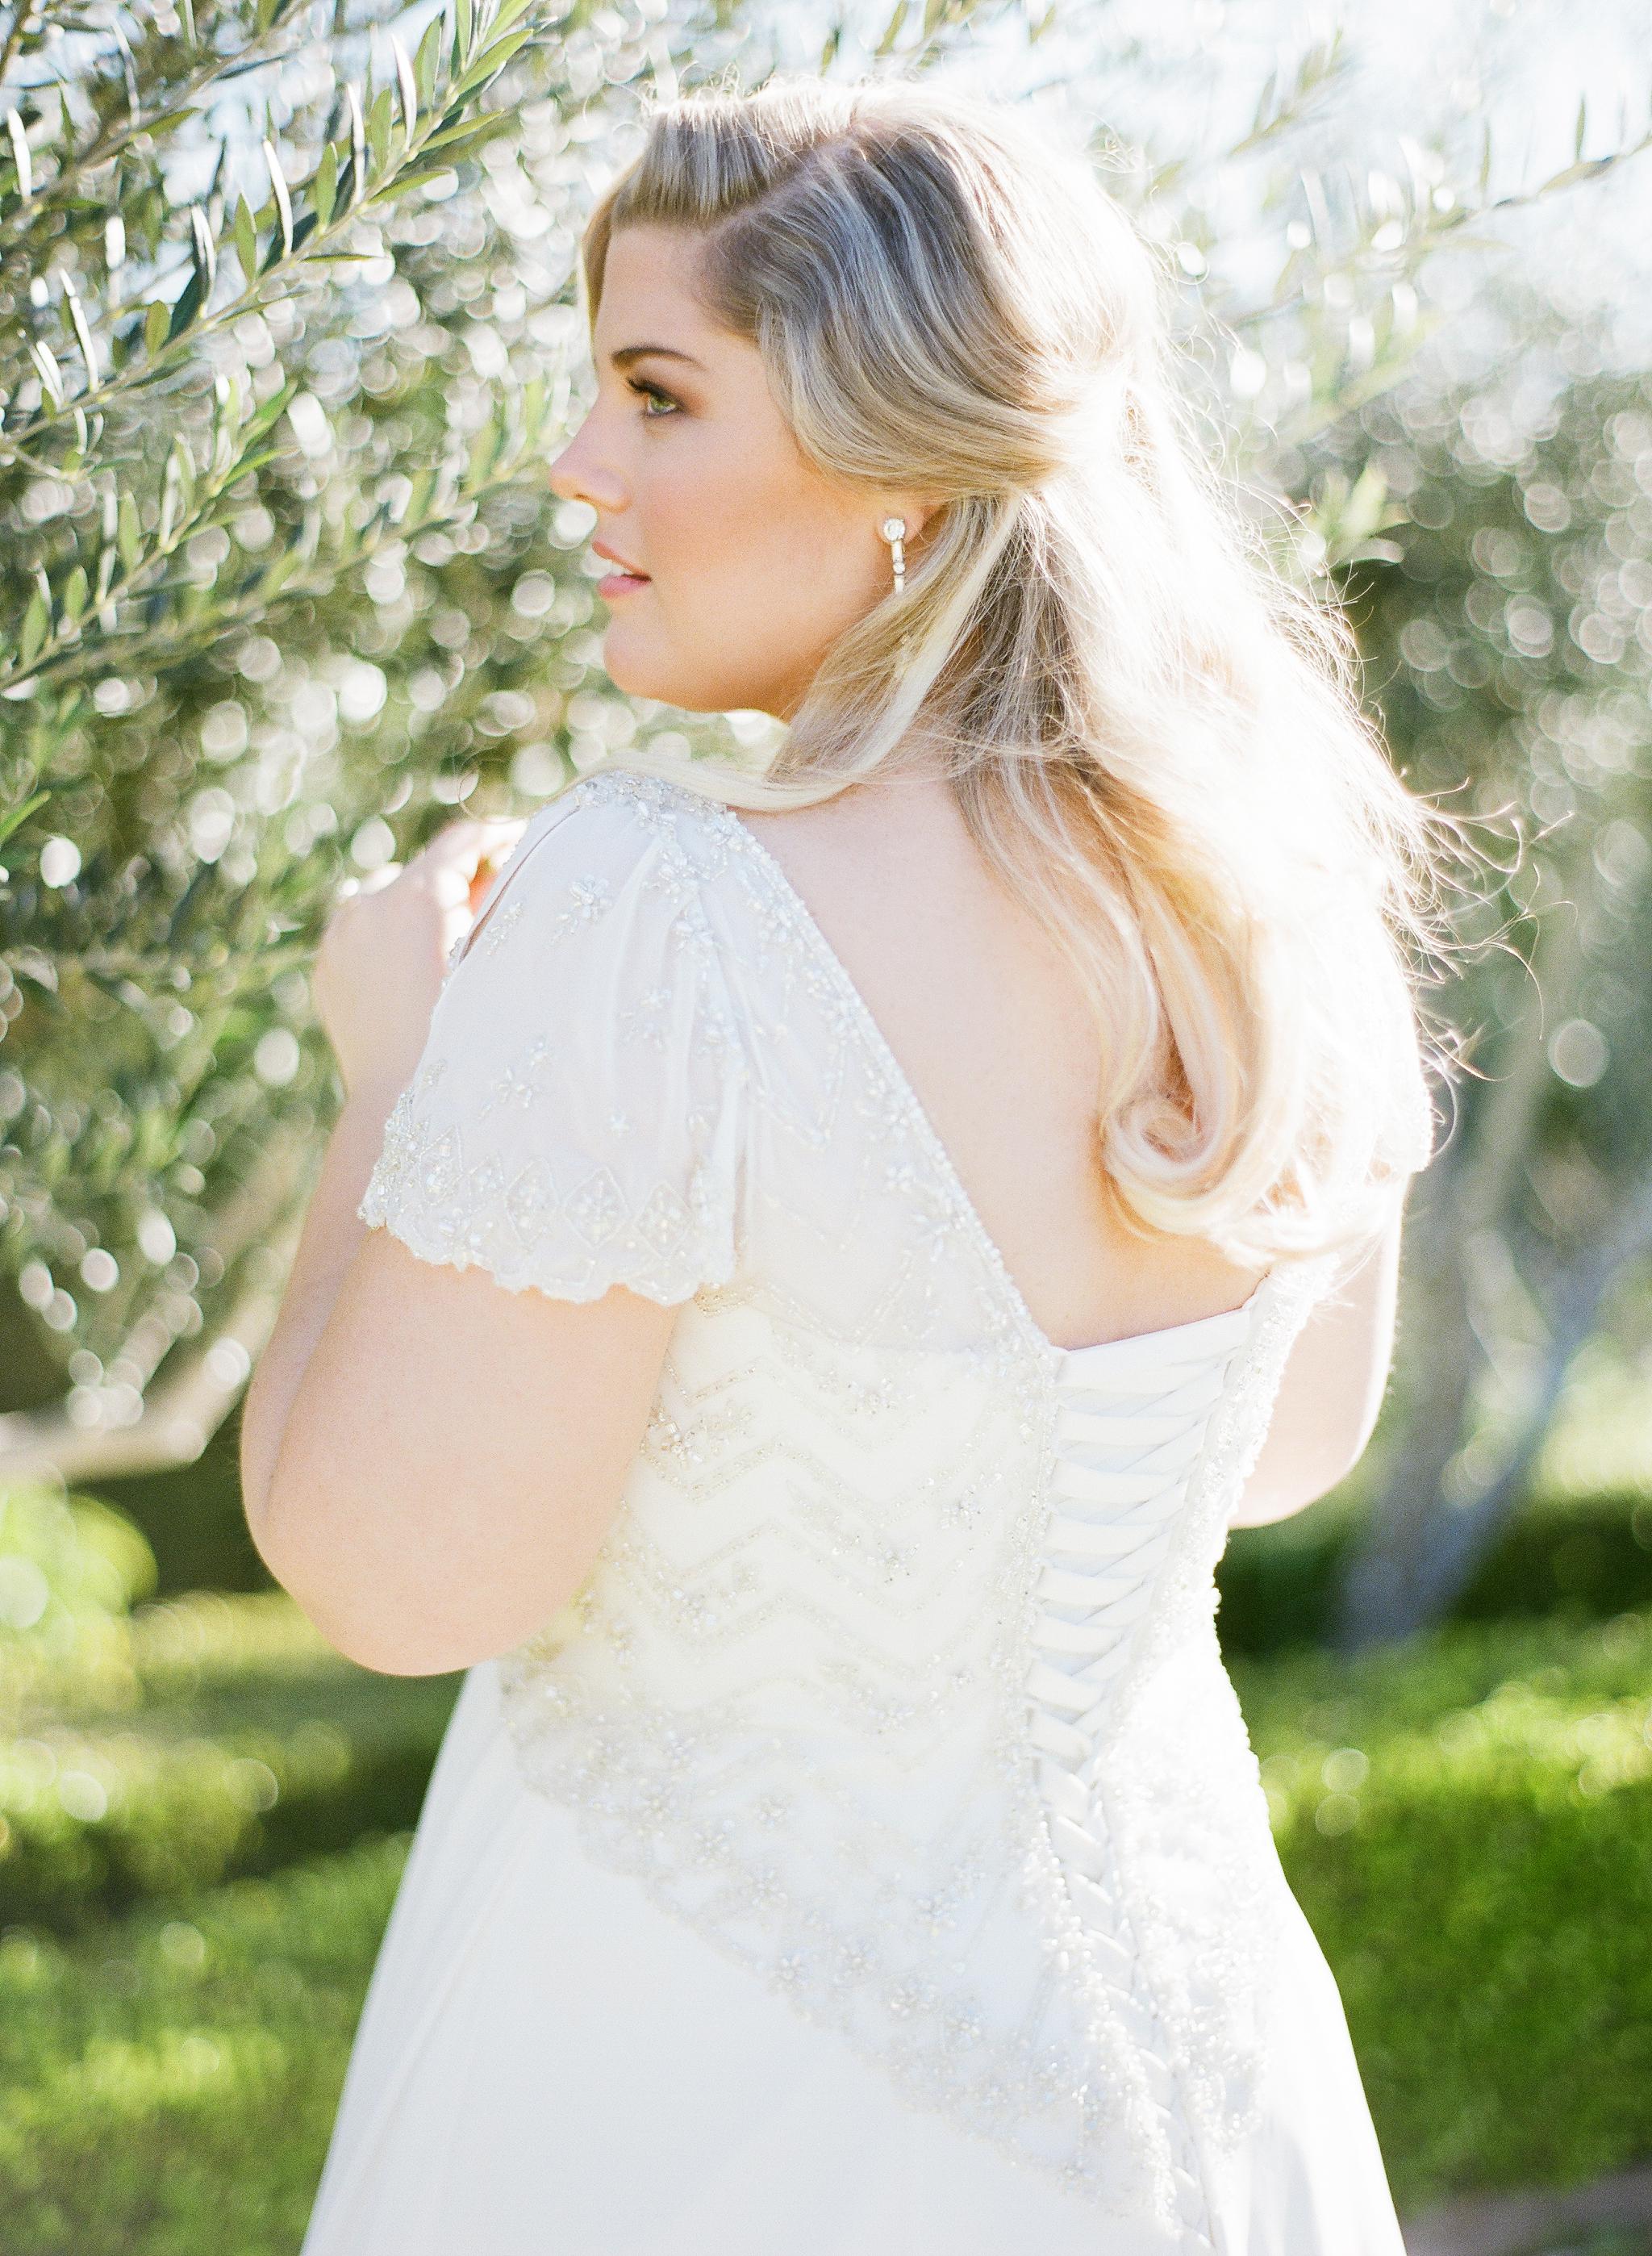 plus size wedding dress, plus size bridal